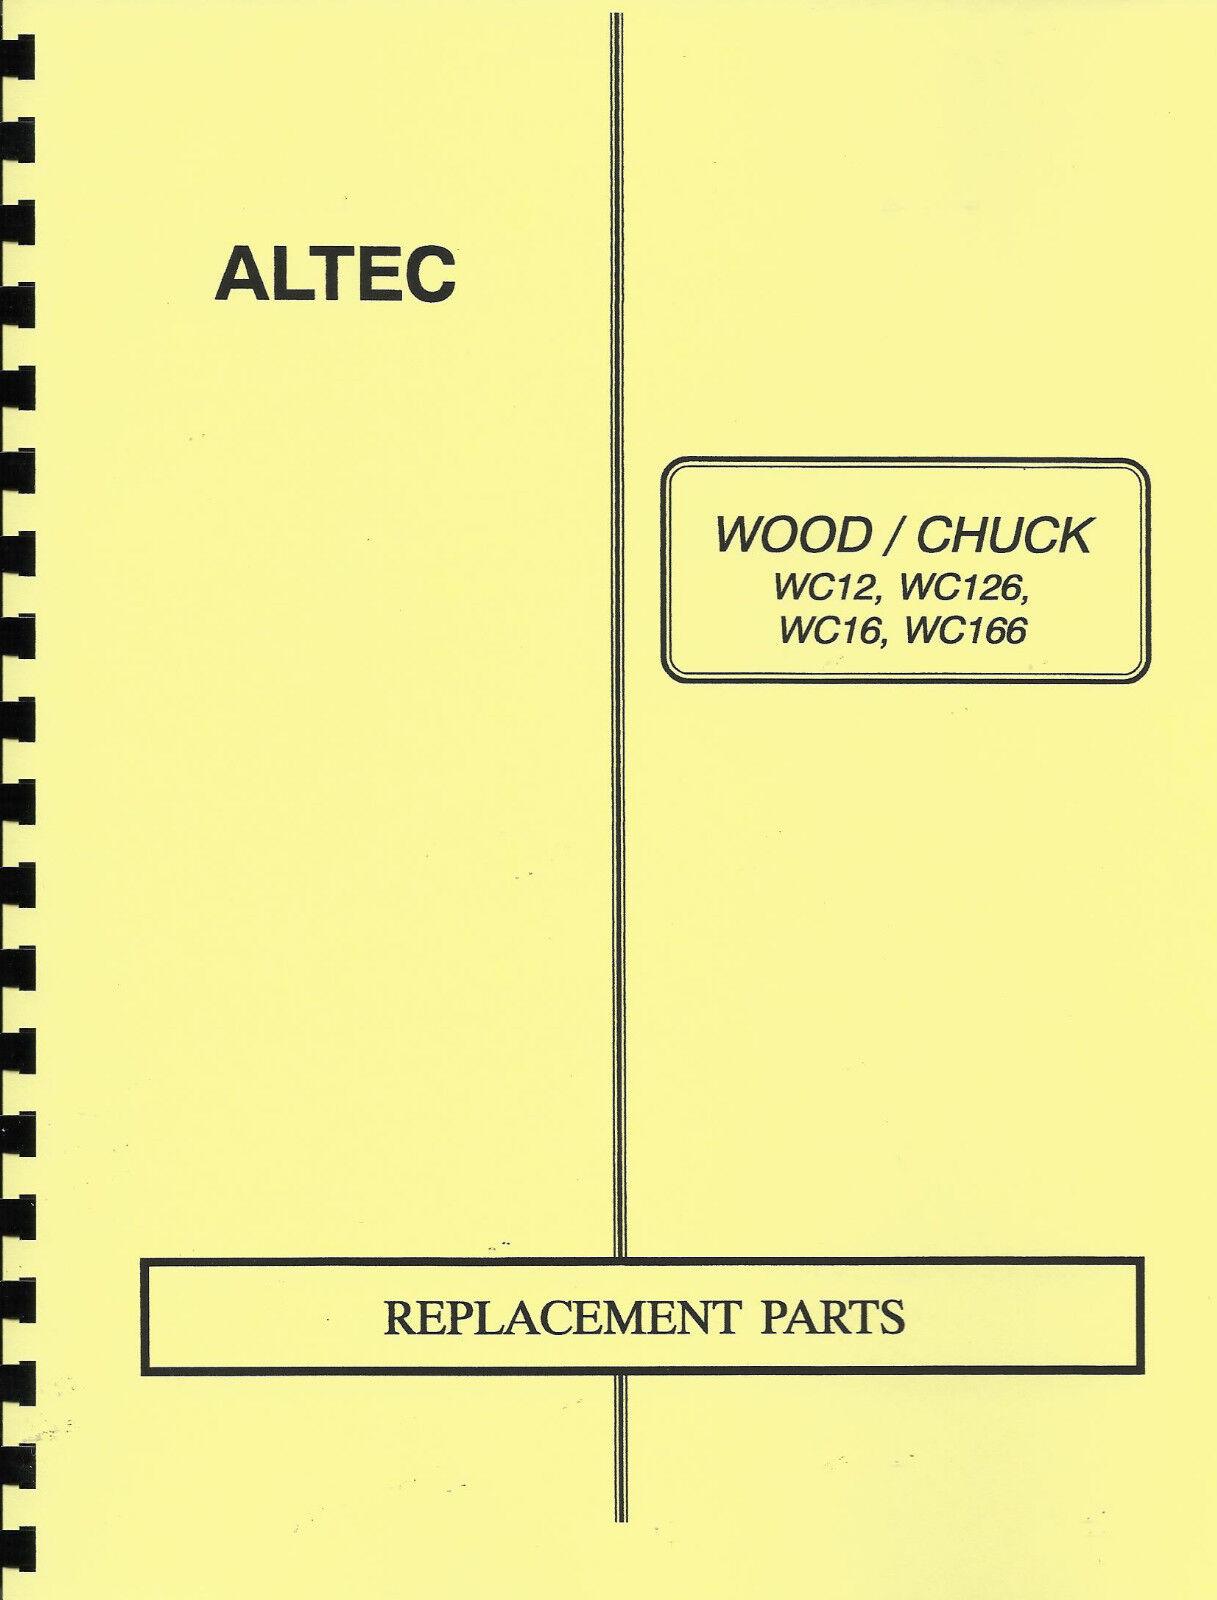 Altec Chipper Wiring Diagram Trusted Diagrams Parts Diy U2022 Ezgo 1975